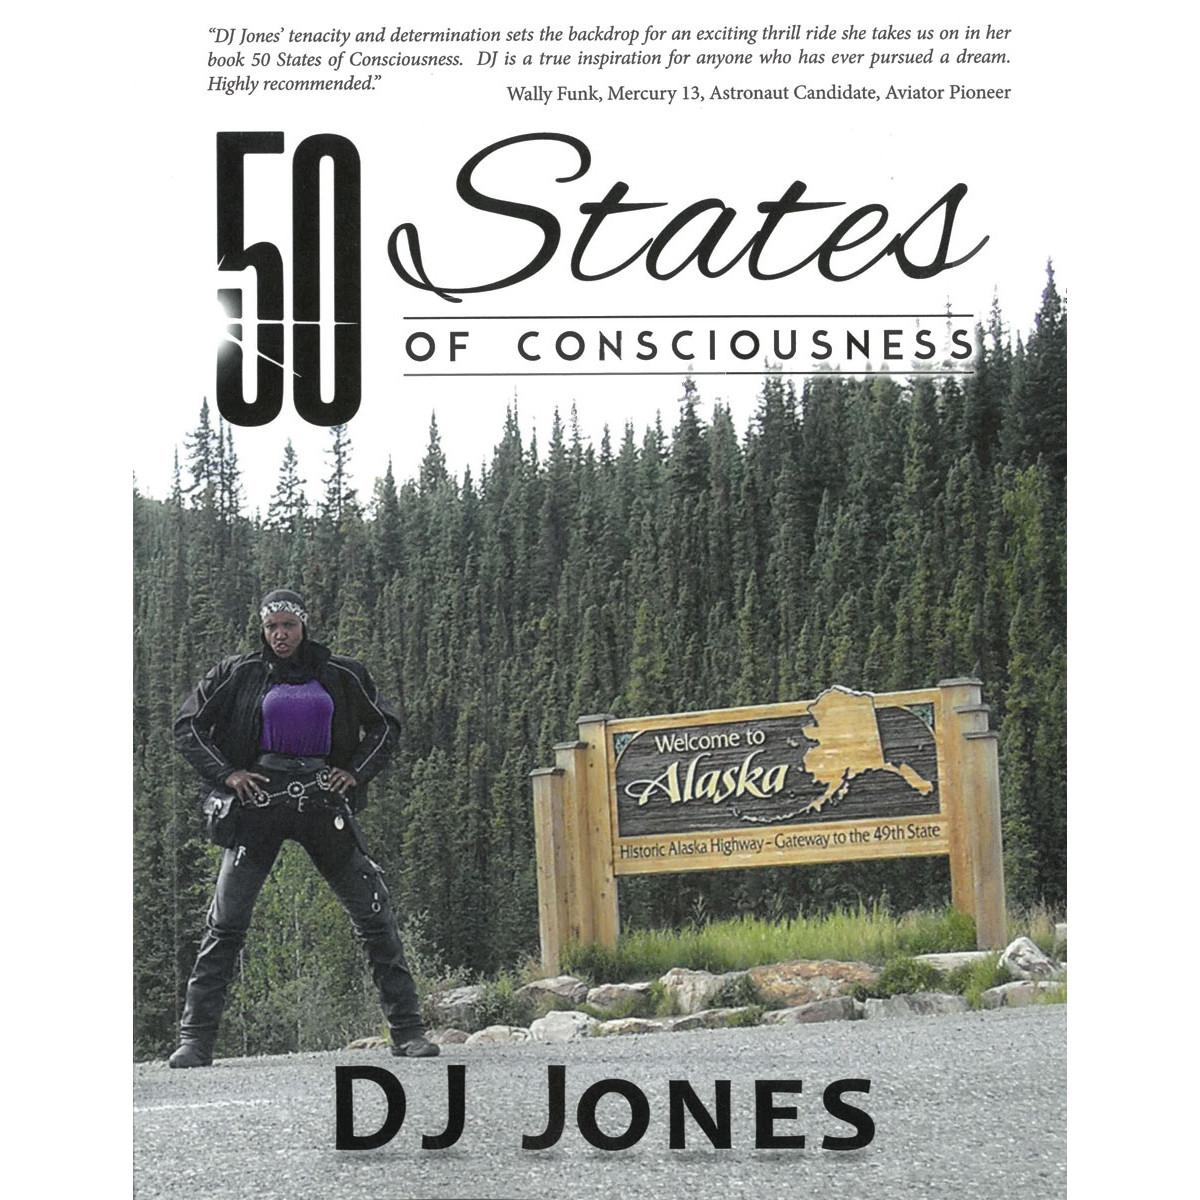 50 States of Consciousness - DJ Jones